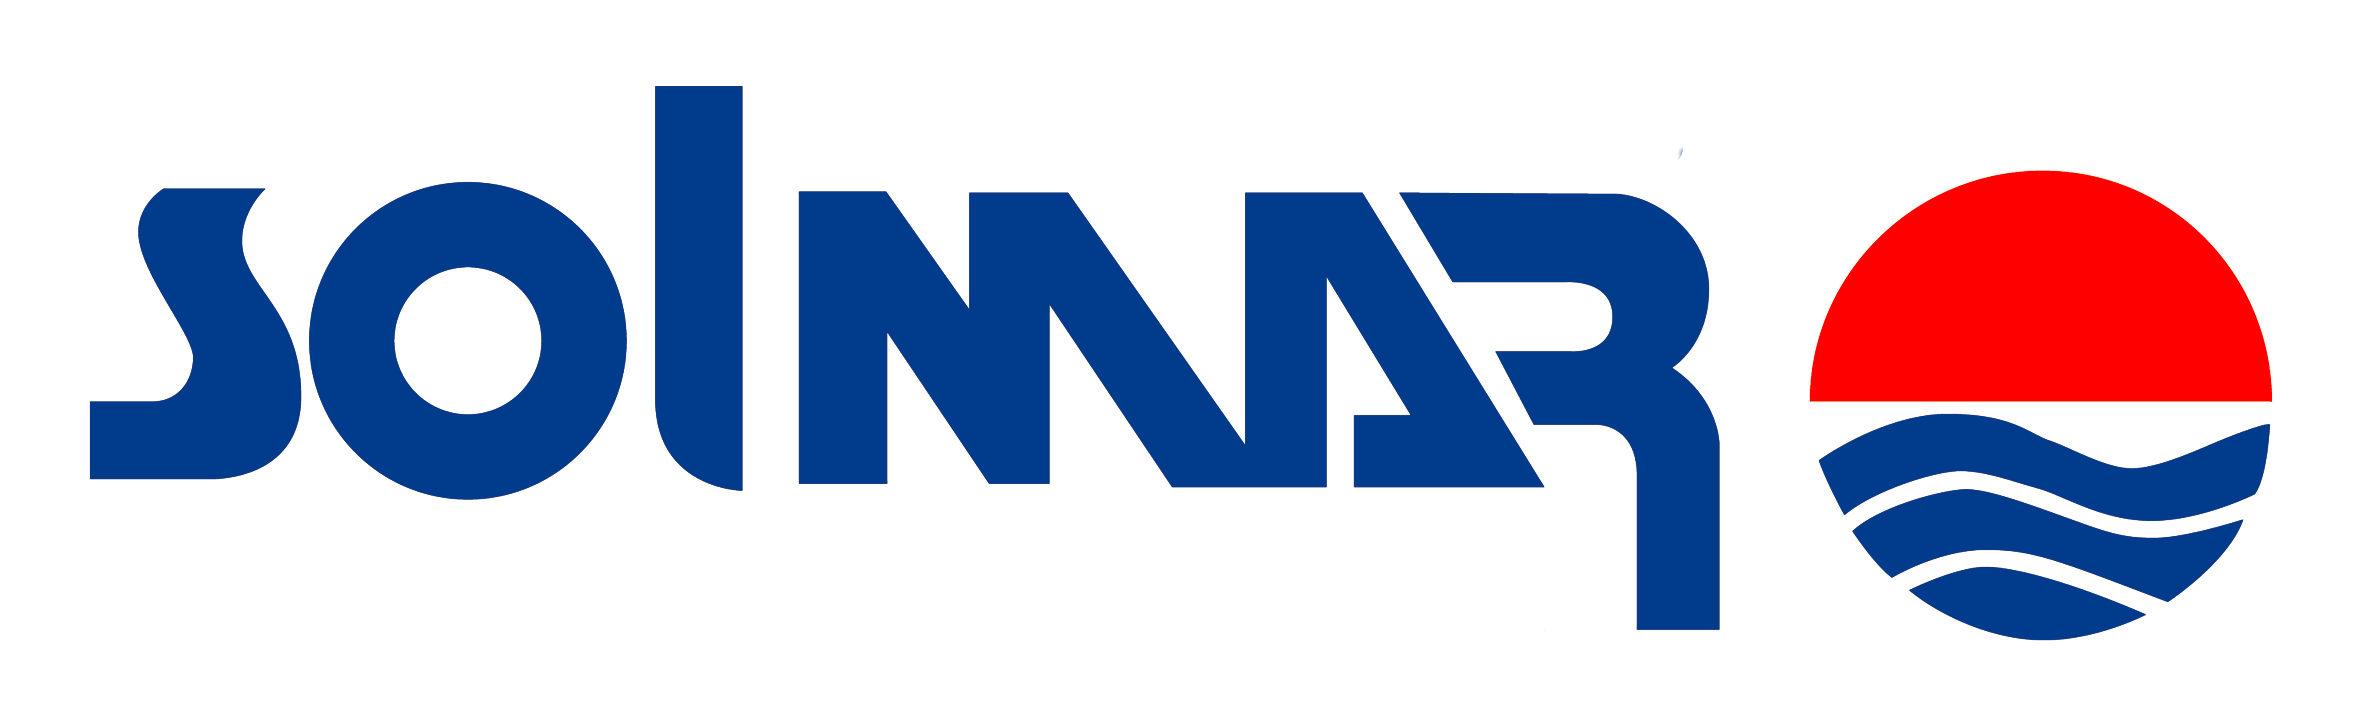 Cropped logo van Solmar Reizen, hét reisbureau van Maasmechelen